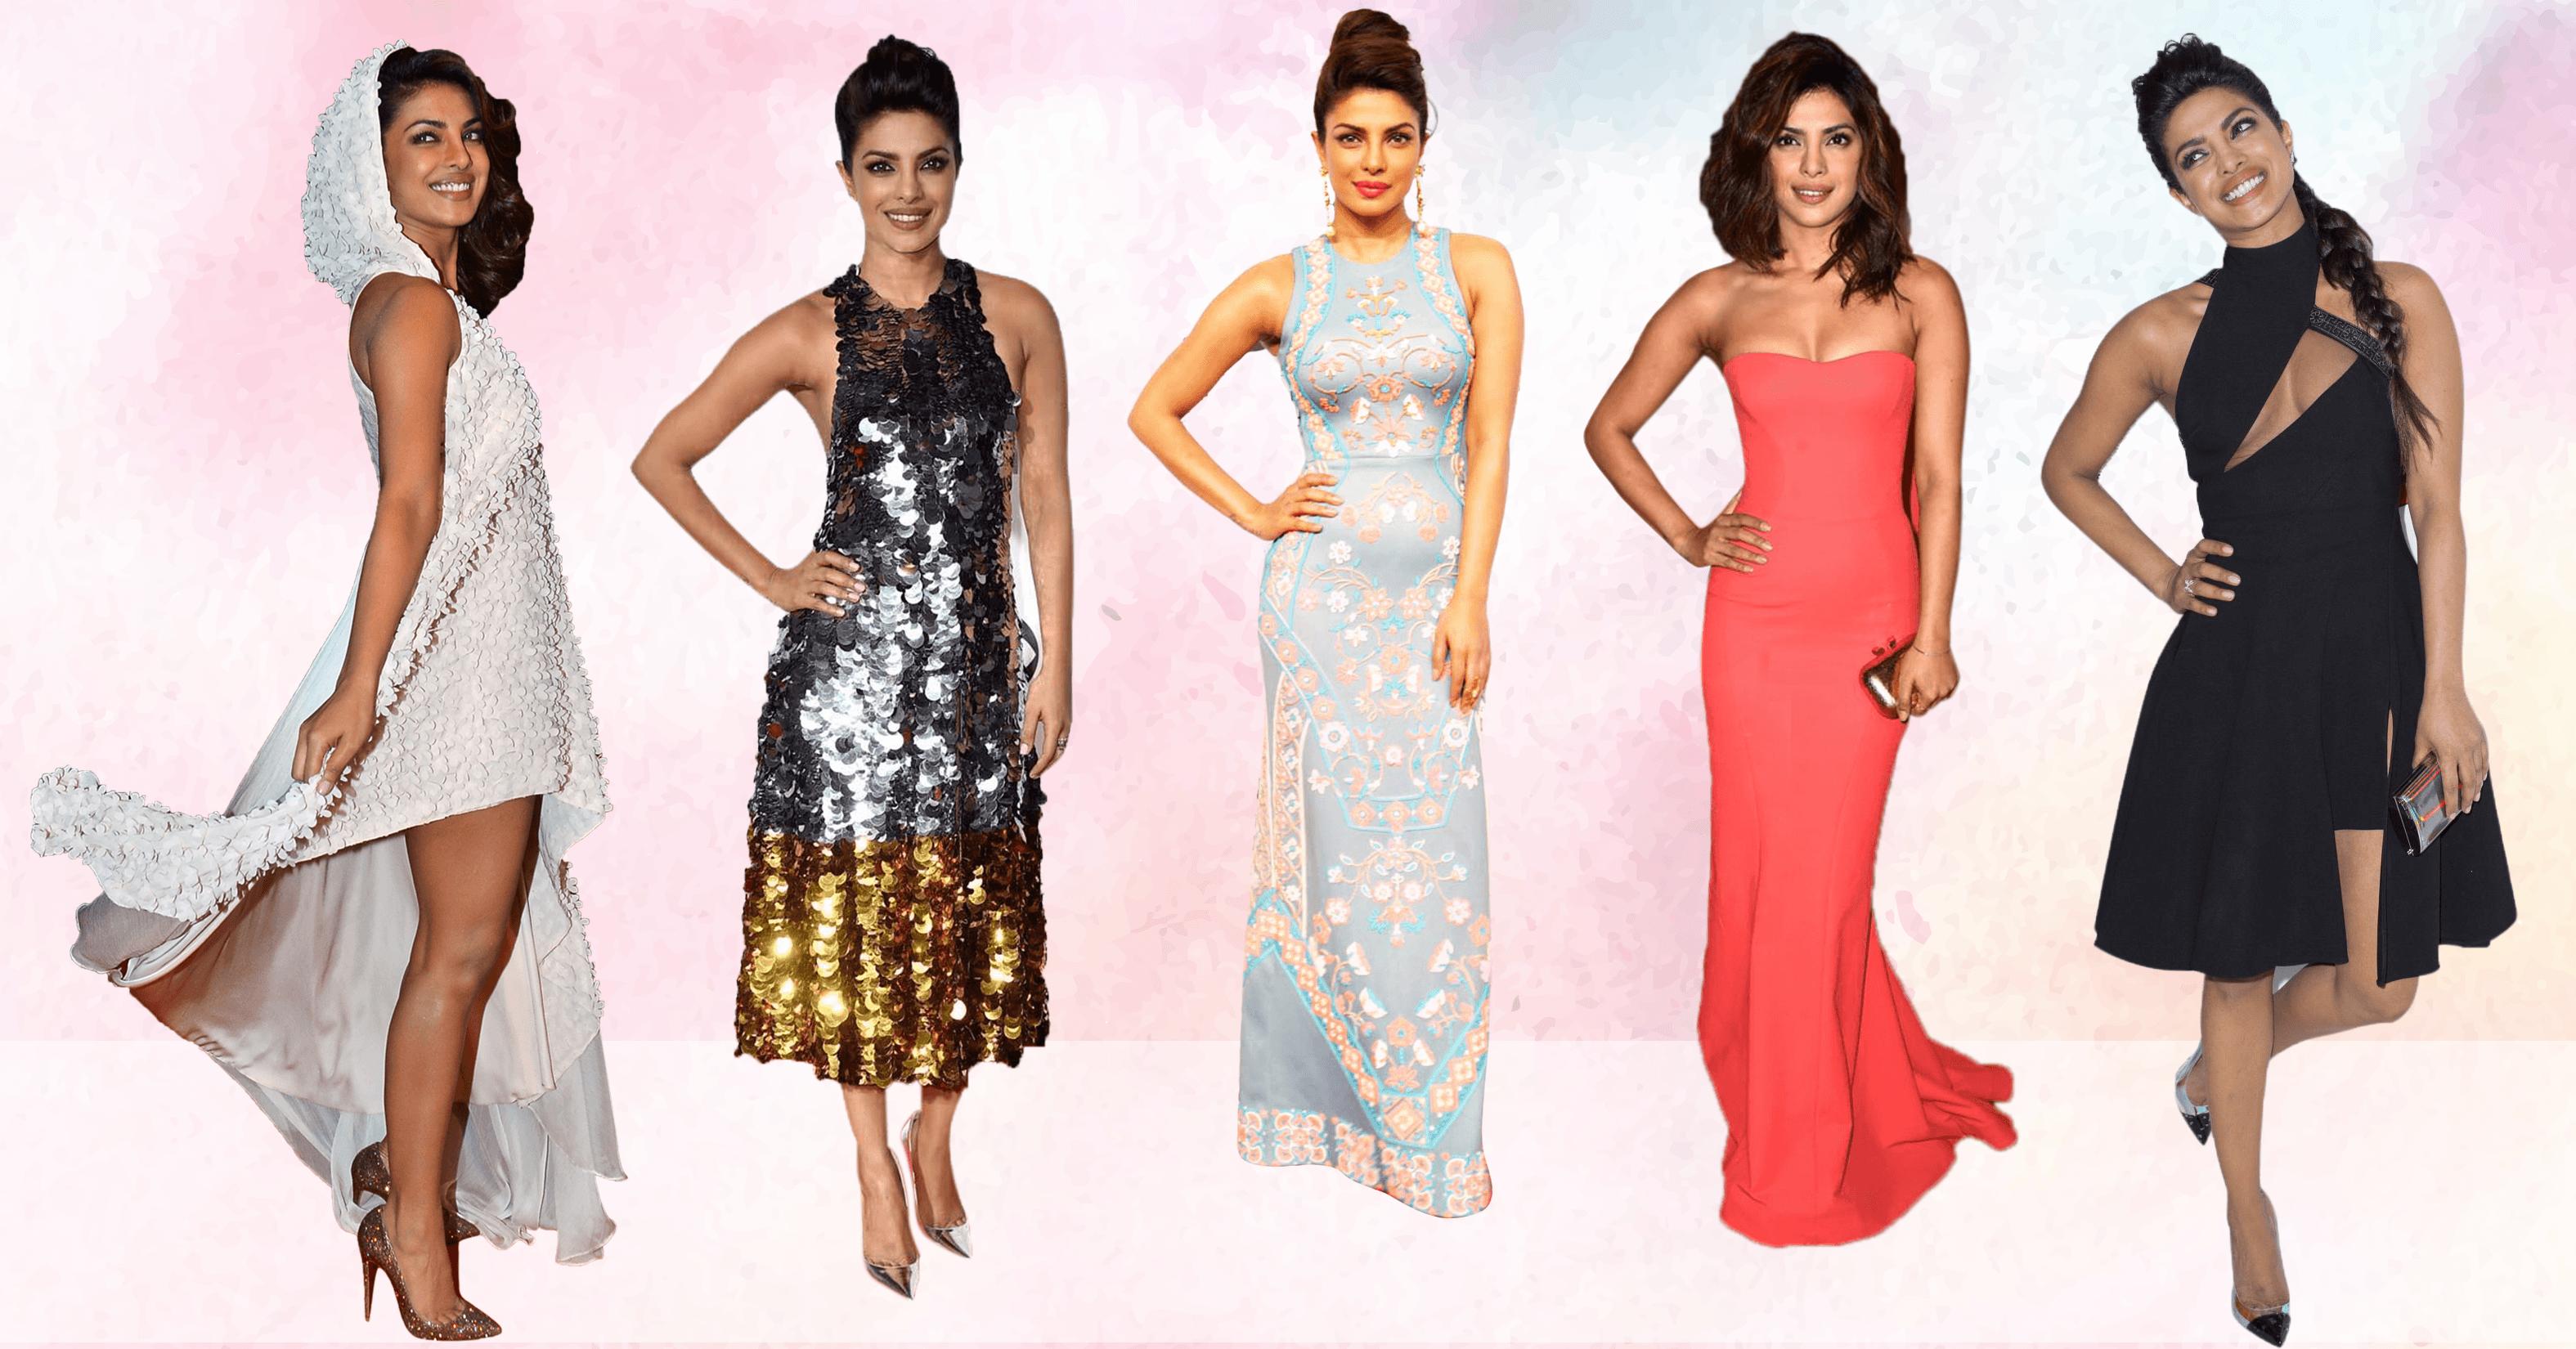 Style_Icon_Priyanka_Chopra_Blog_image_fashion_style